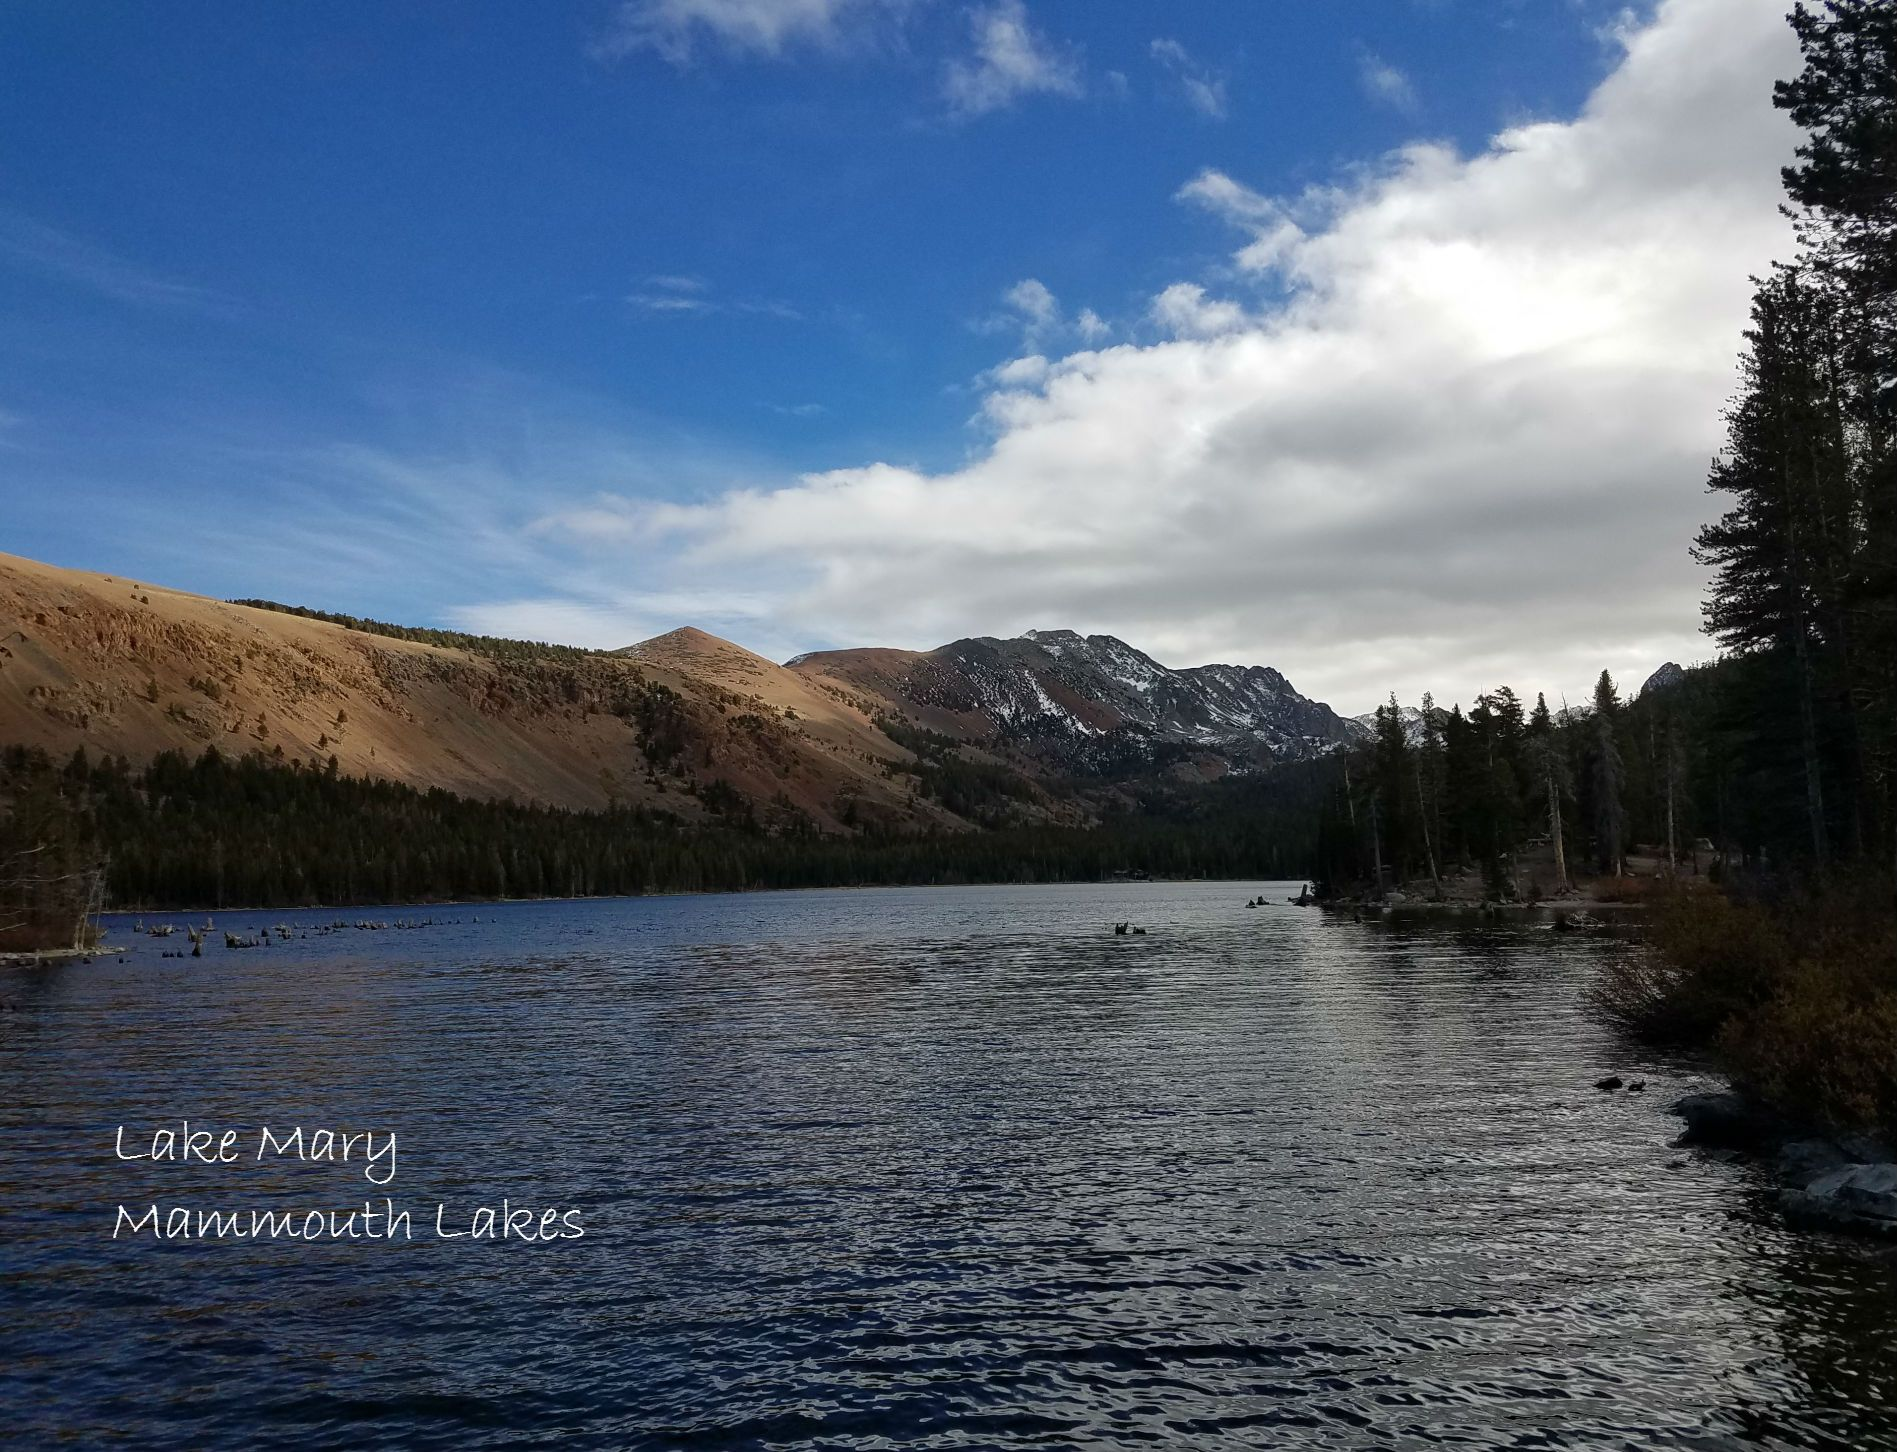 Lake mary and the mammoth lakes region mammoth lakes